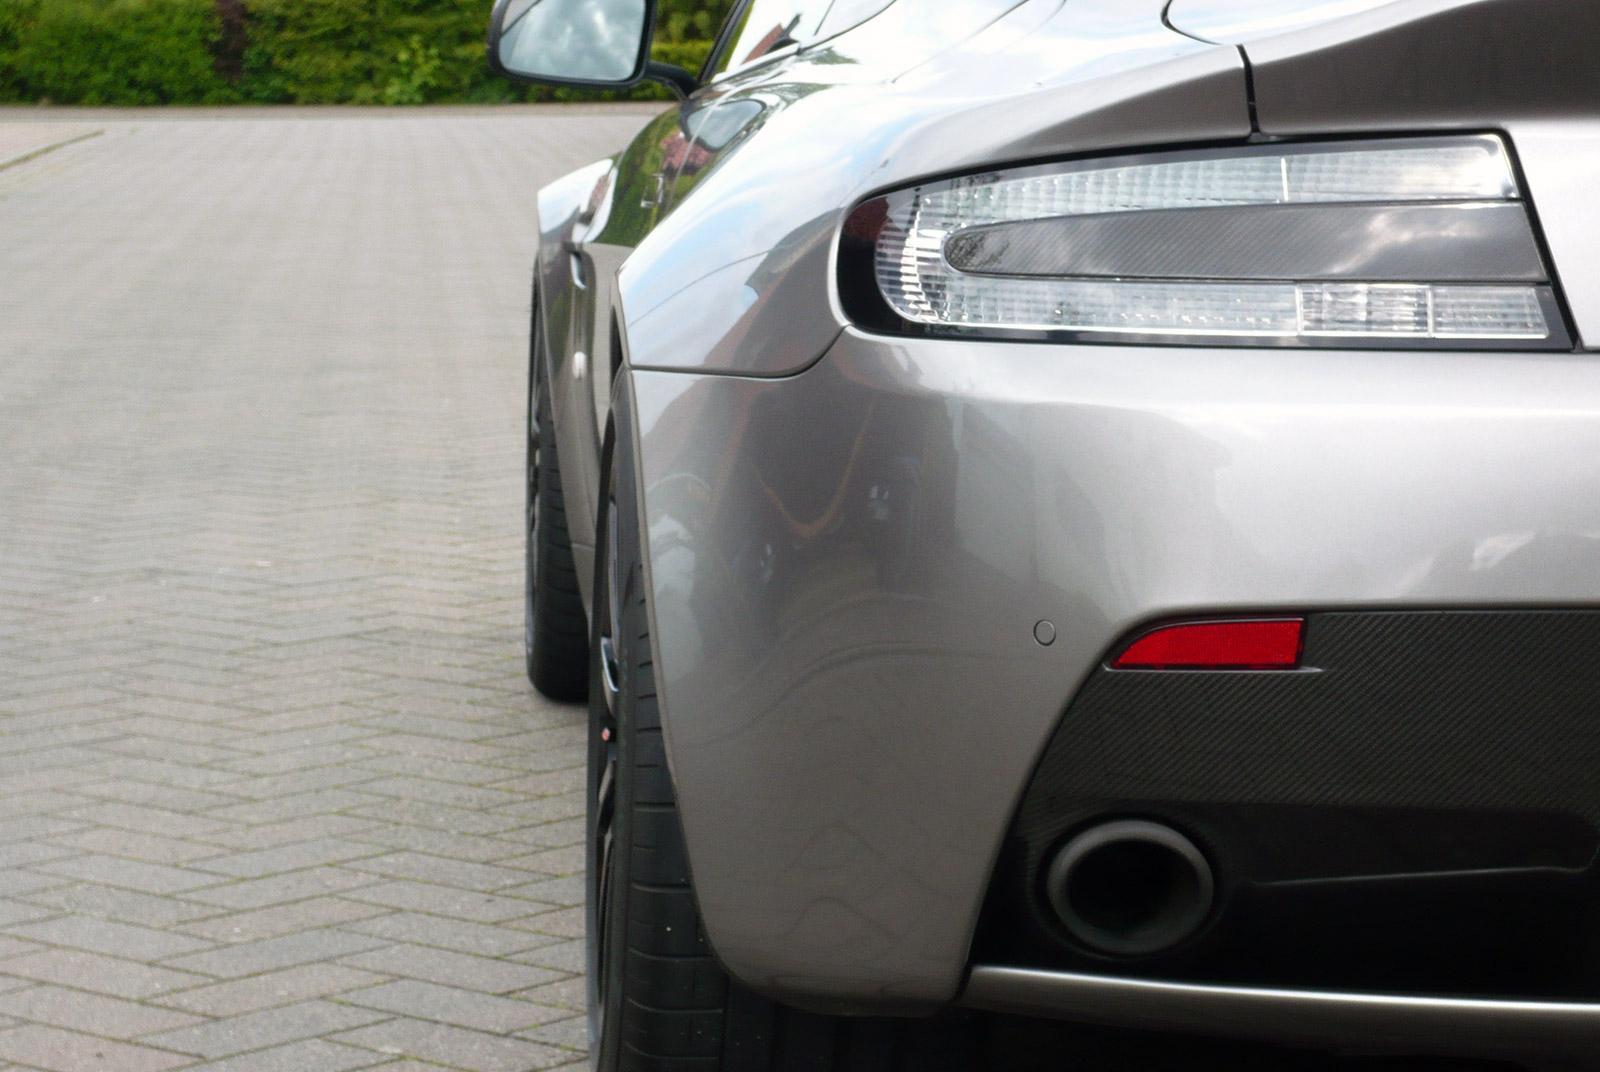 AM-2995-Aston-Martin_V12-Vantage-S_Grau_Schwarz_17